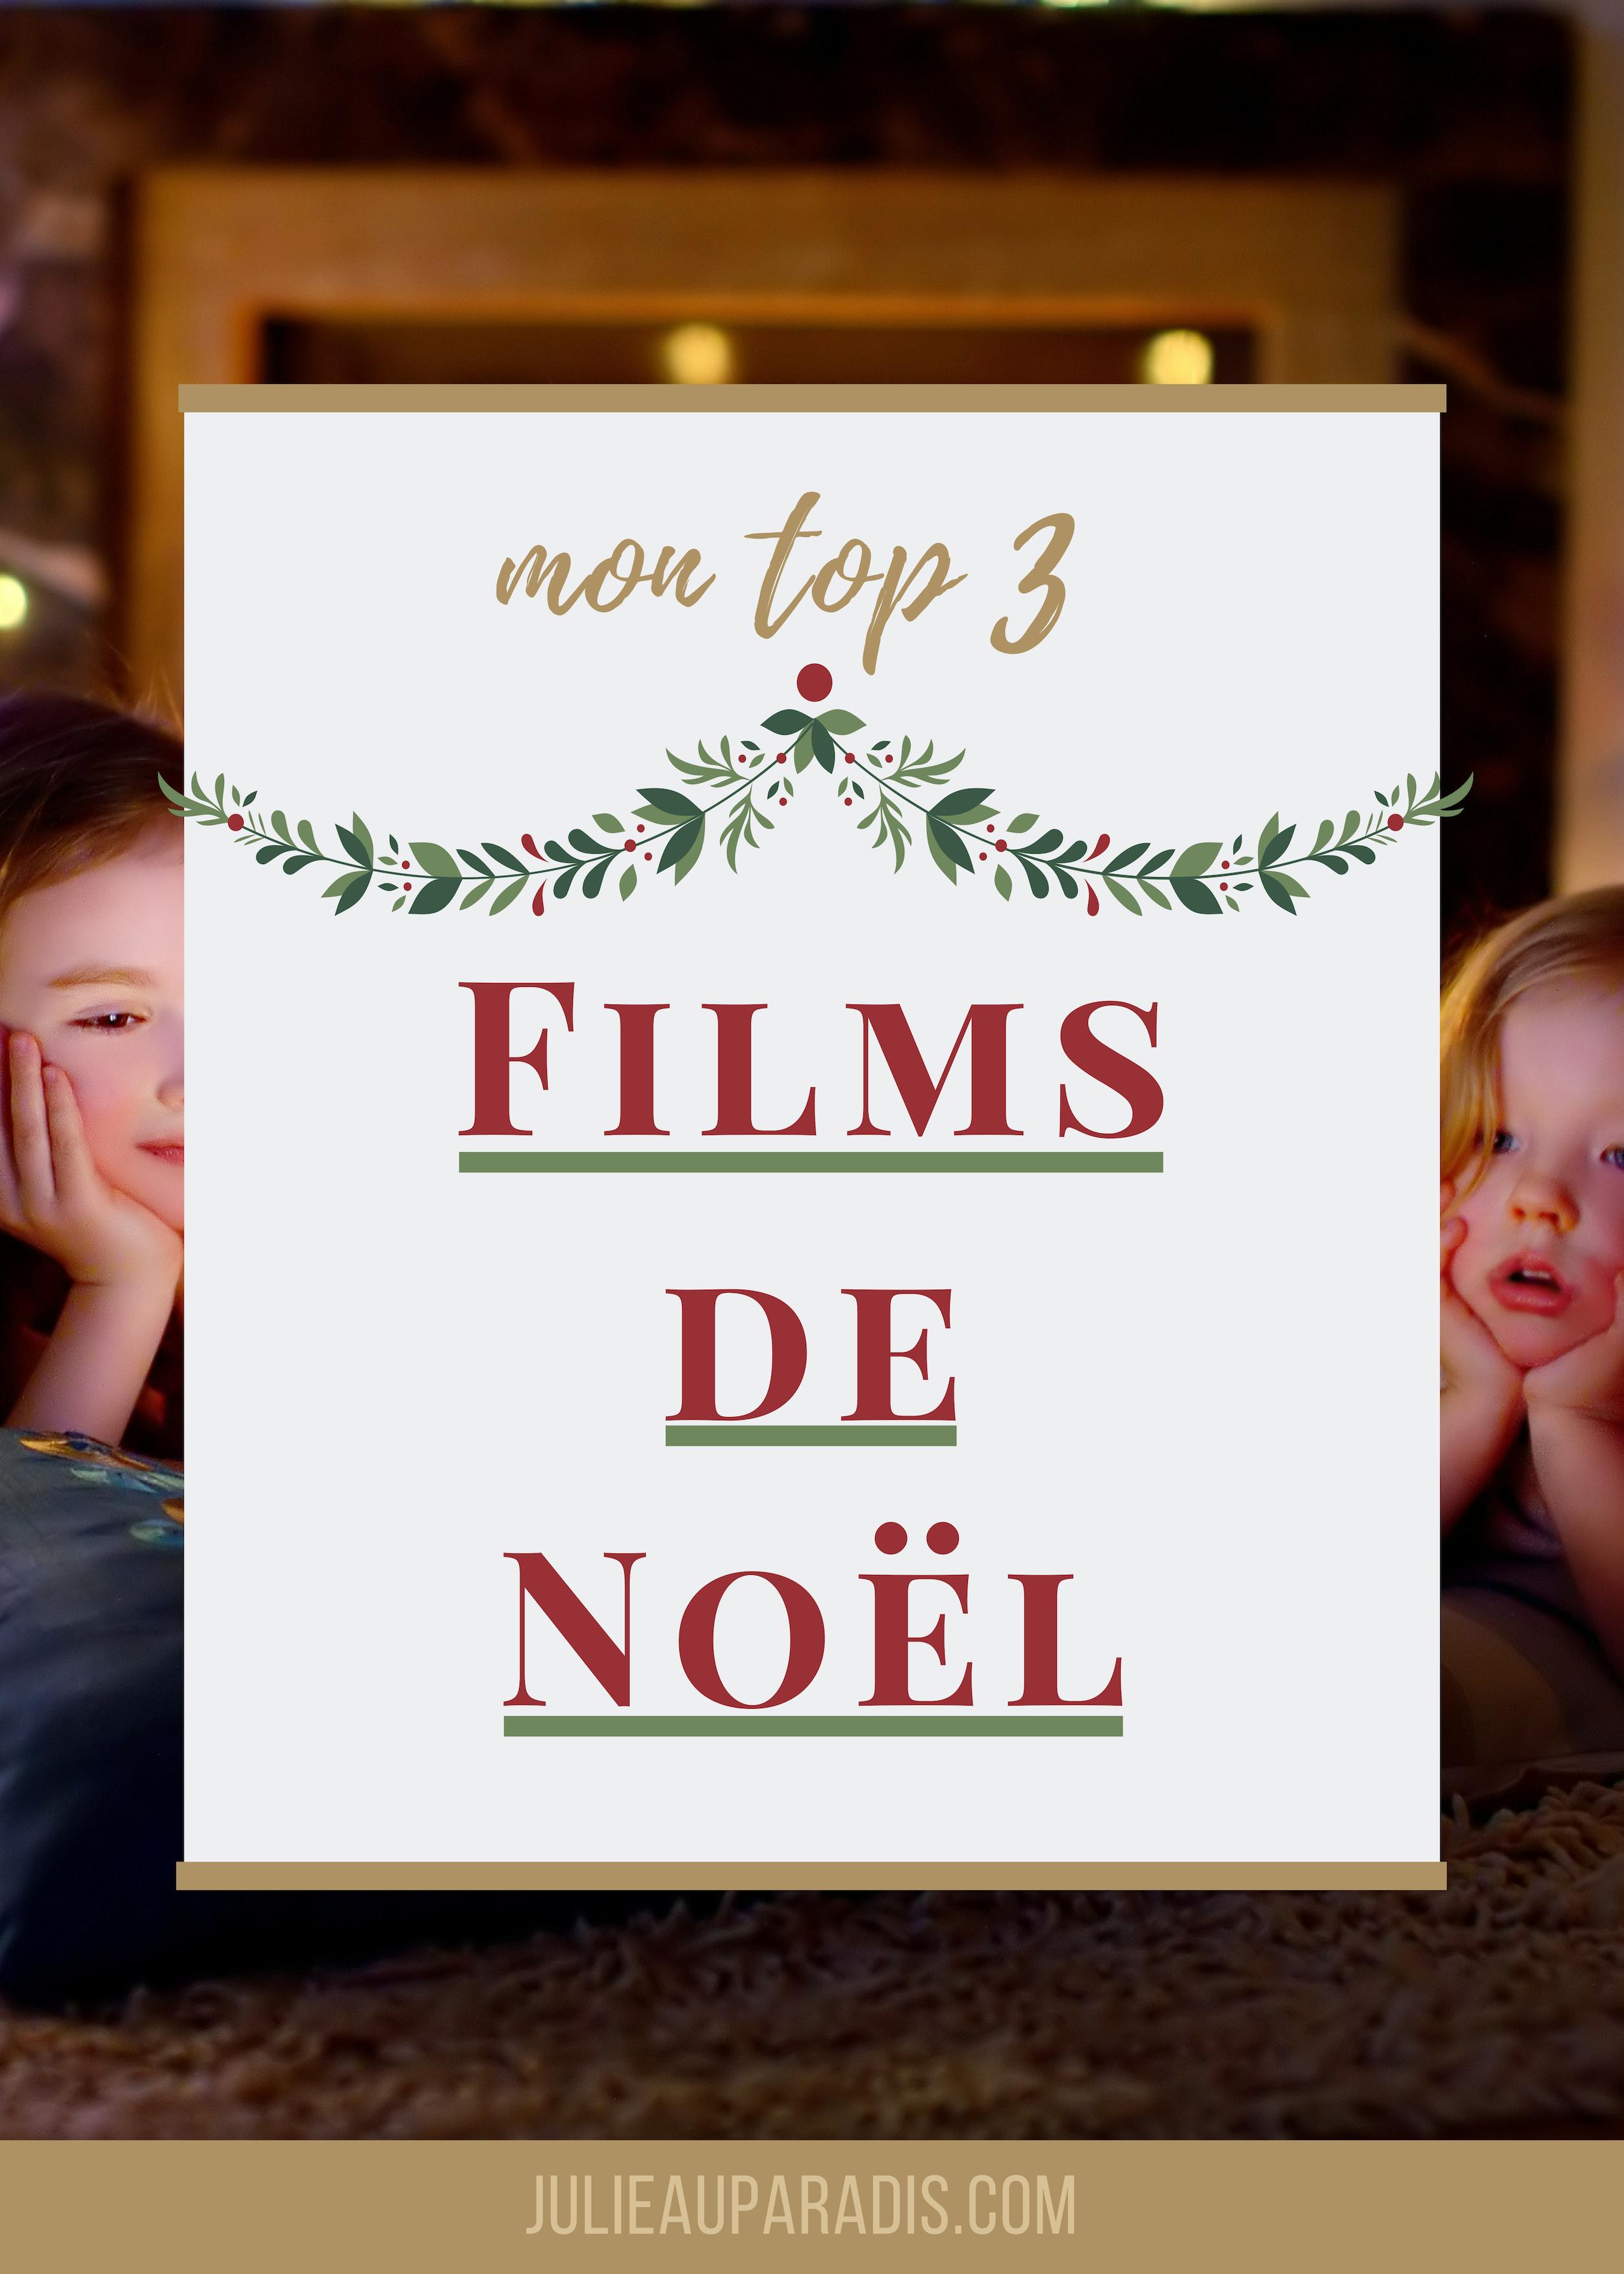 Top 3 films de Noël.png